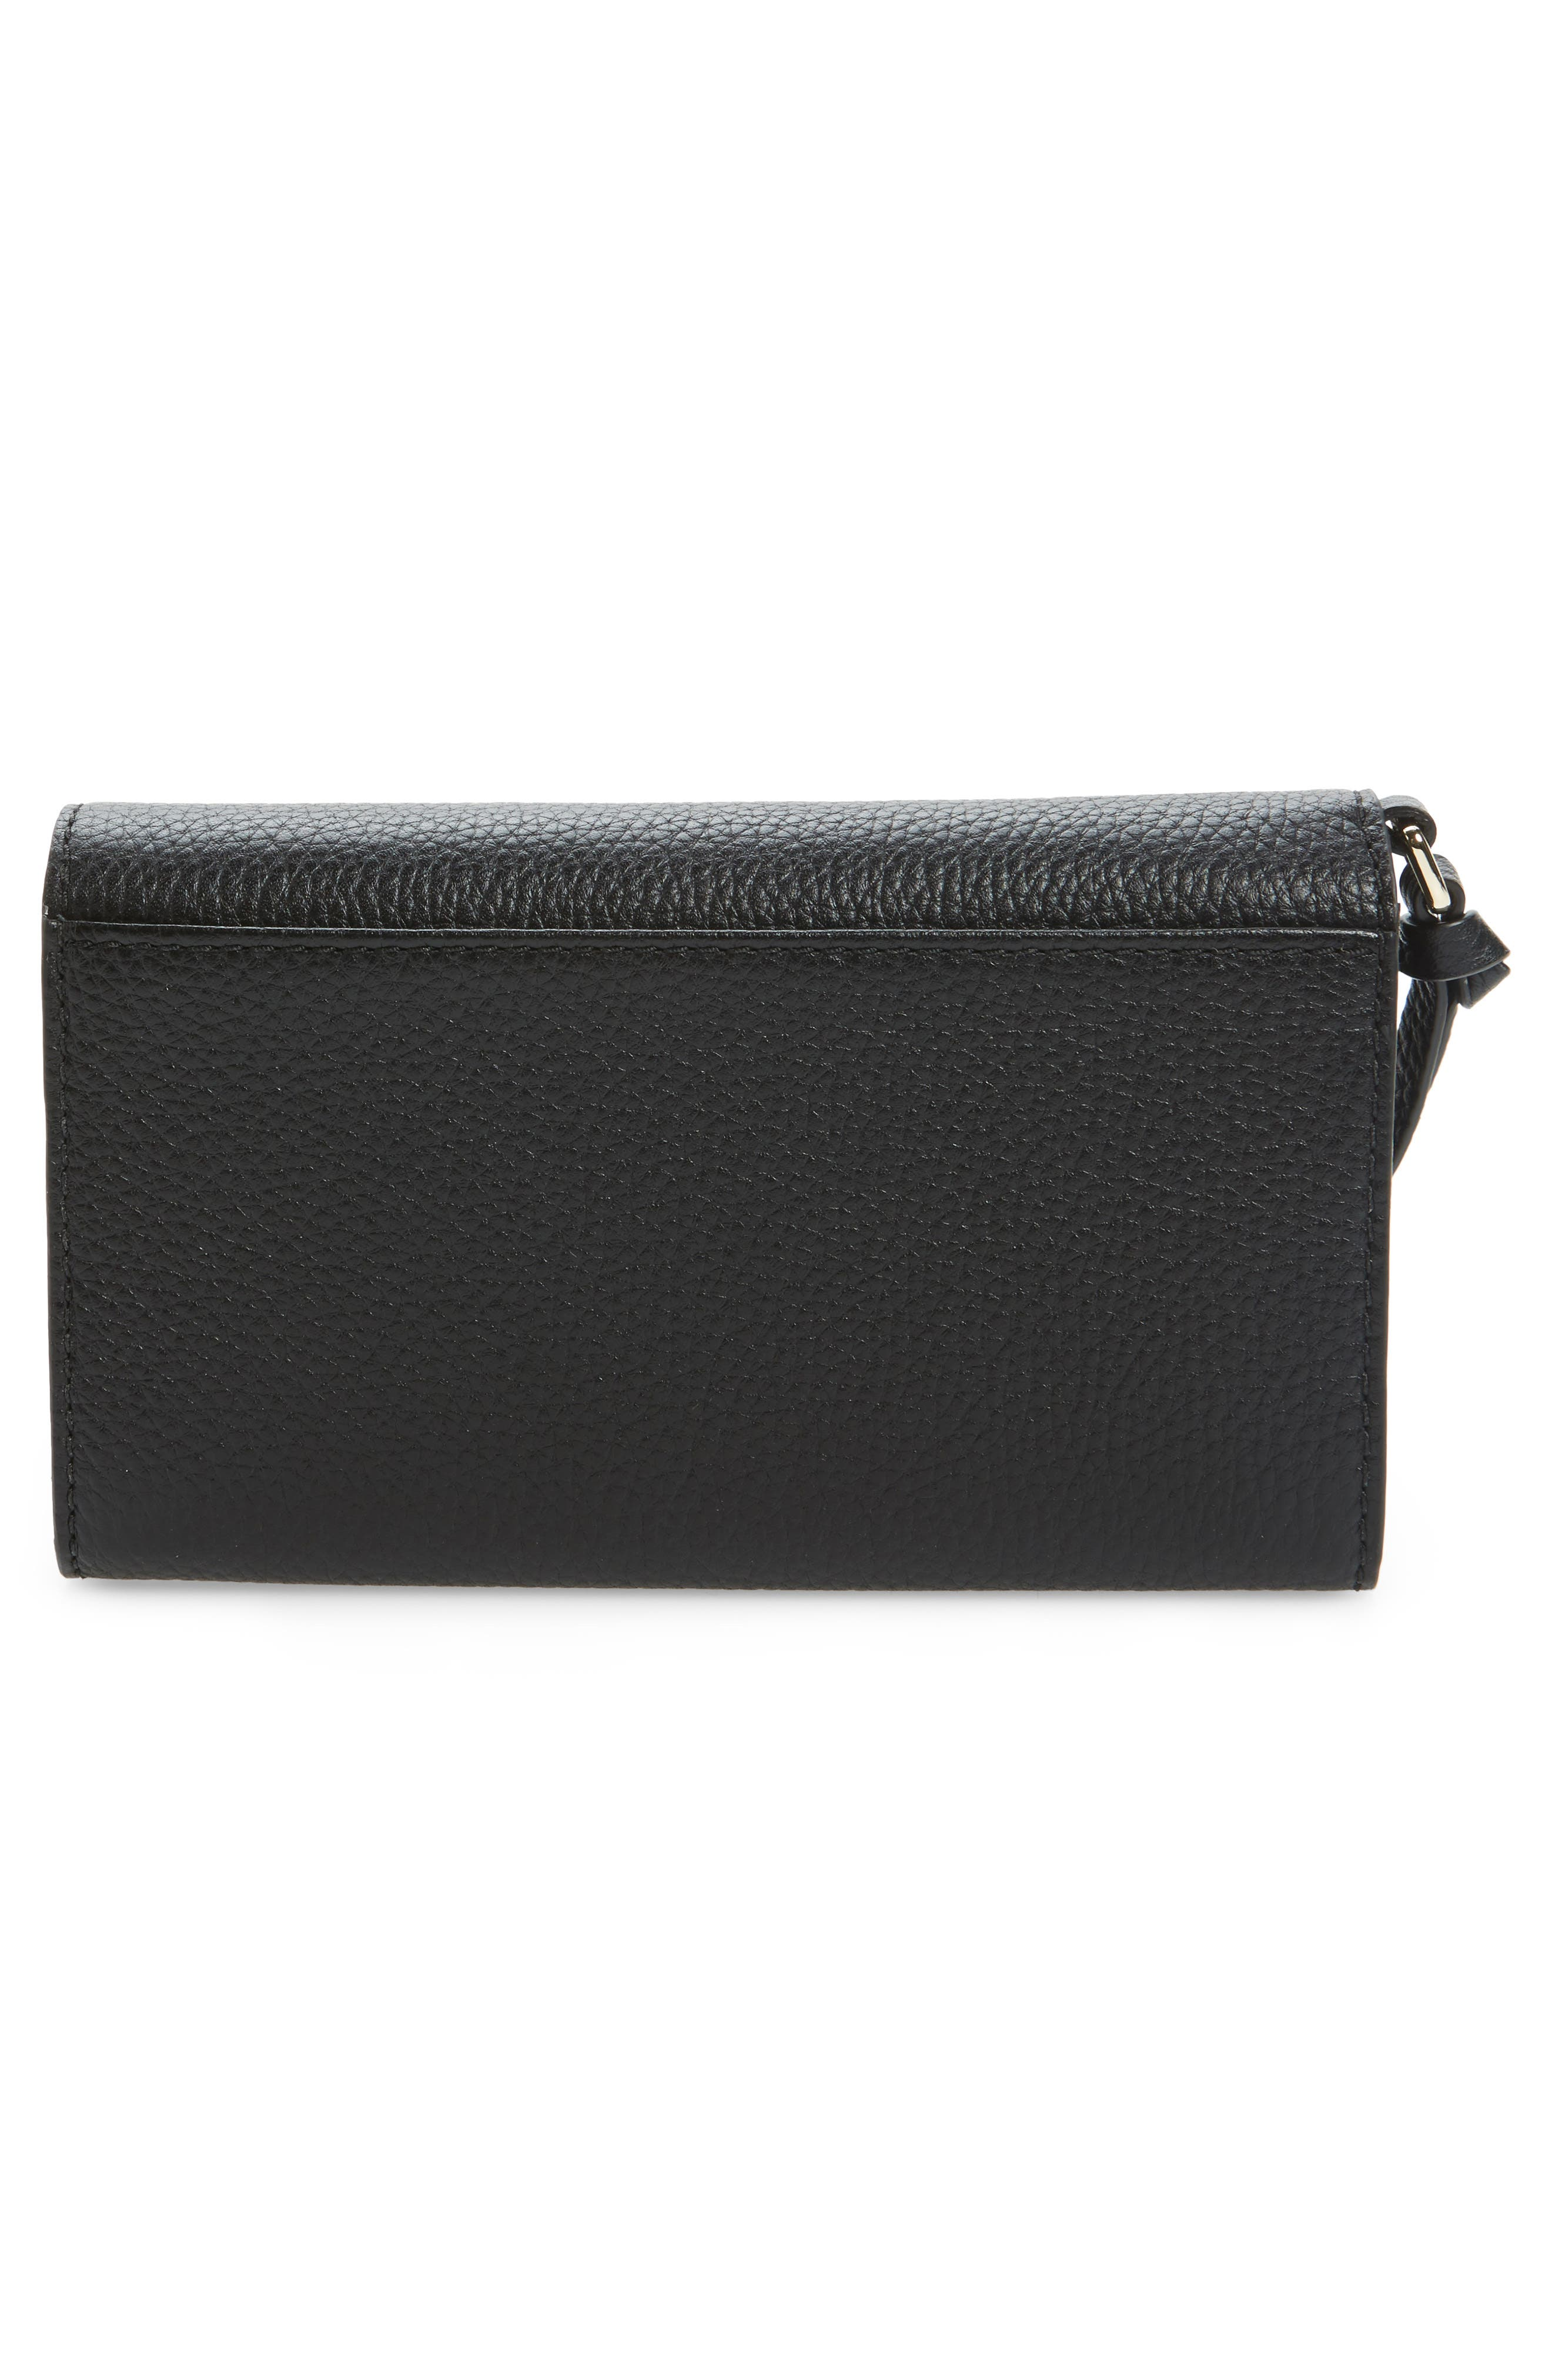 jackson street malorie leather wallet,                             Alternate thumbnail 4, color,                             Black